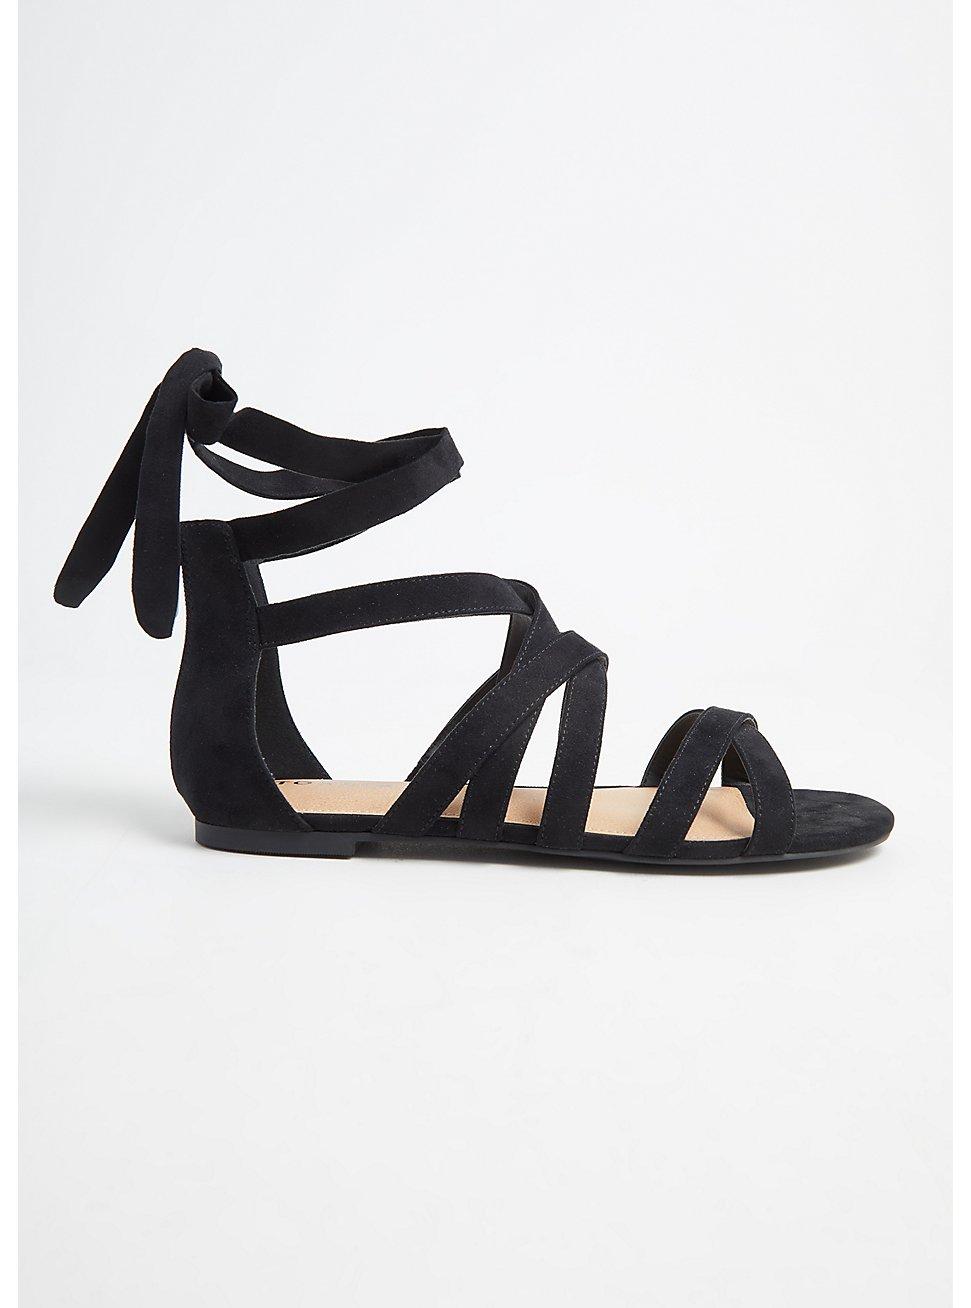 Black Faux Suede Ankle Wrap Gladiator Sandal (WW), BLACK, hi-res